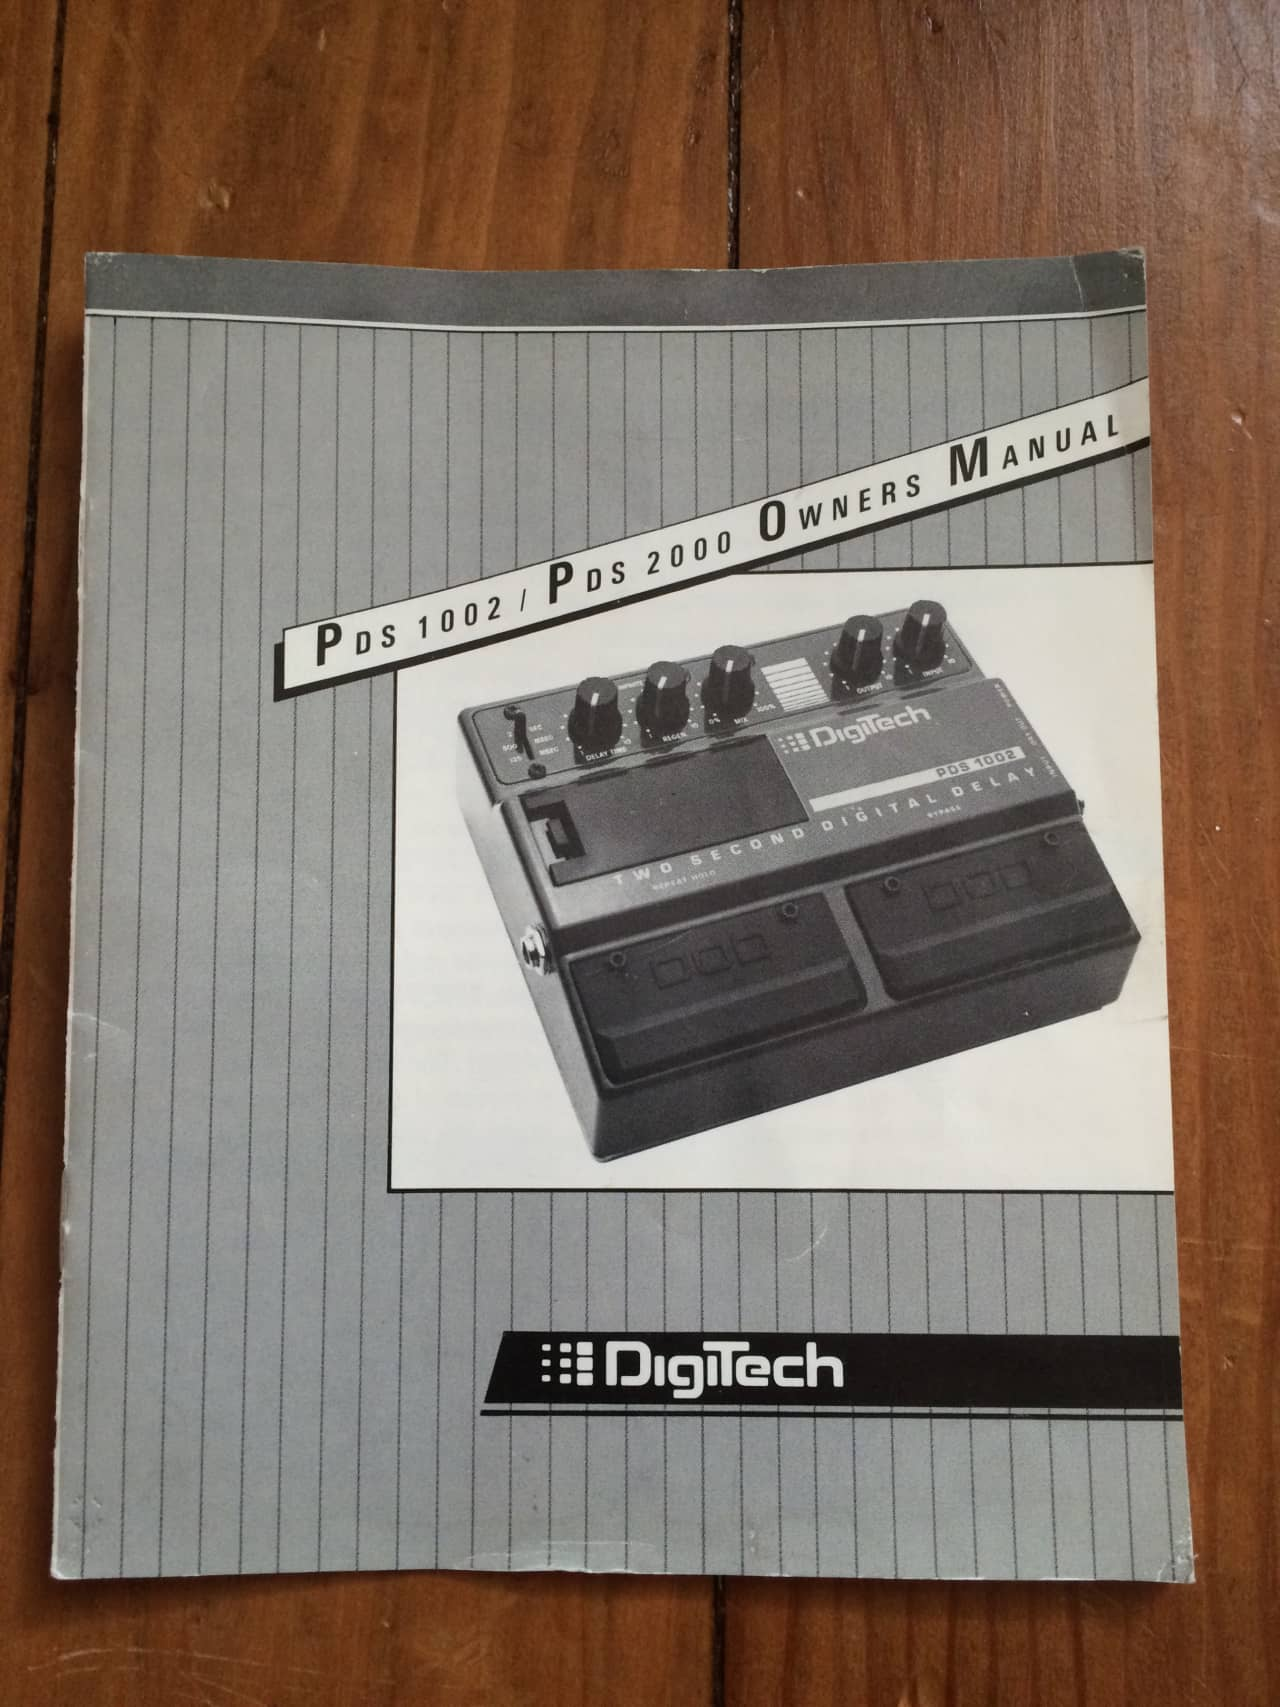 Digitech pds 1002 manual